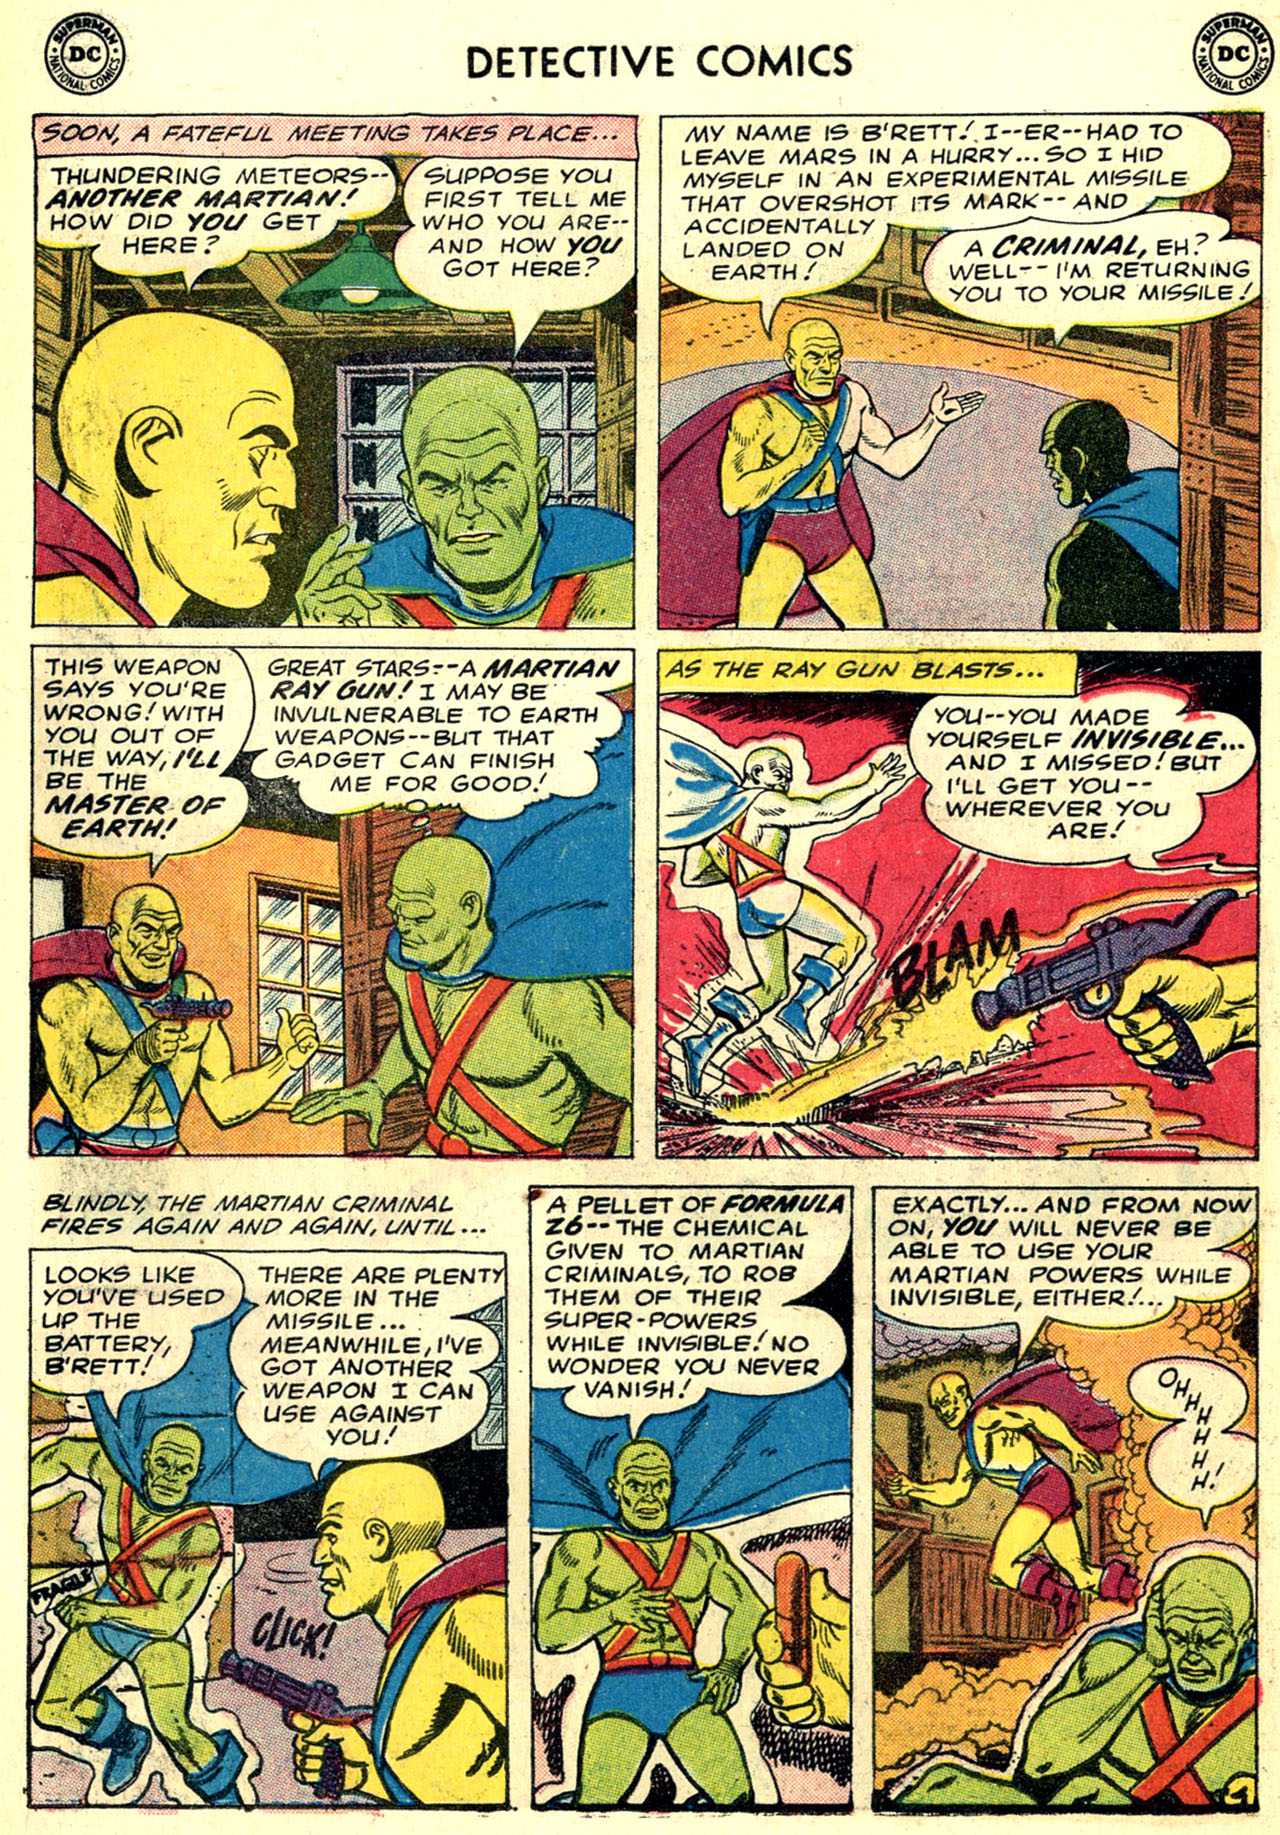 Detective Comics (1937) 273 Page 29